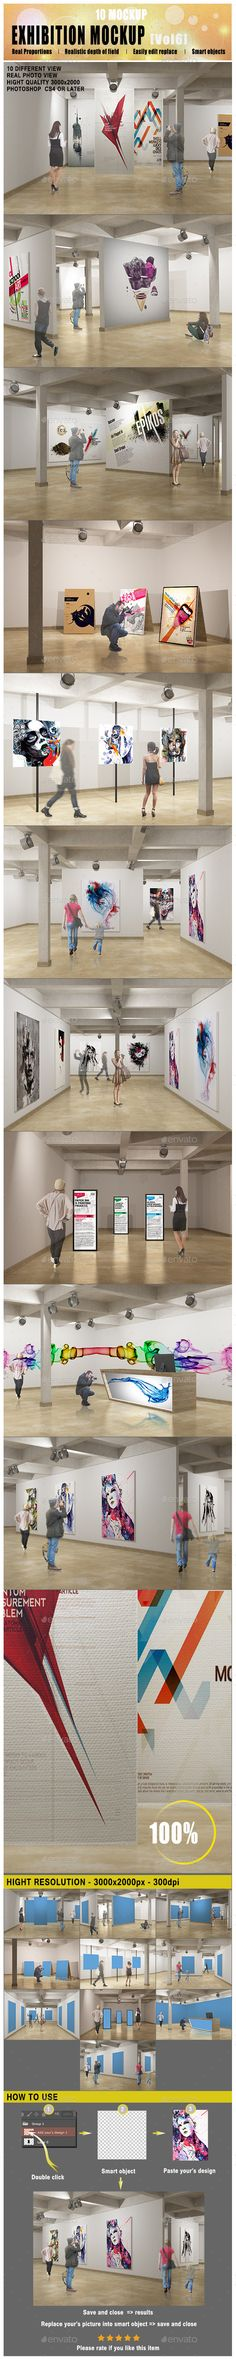 Exhibition Mockup [vol 6] - Posters Print